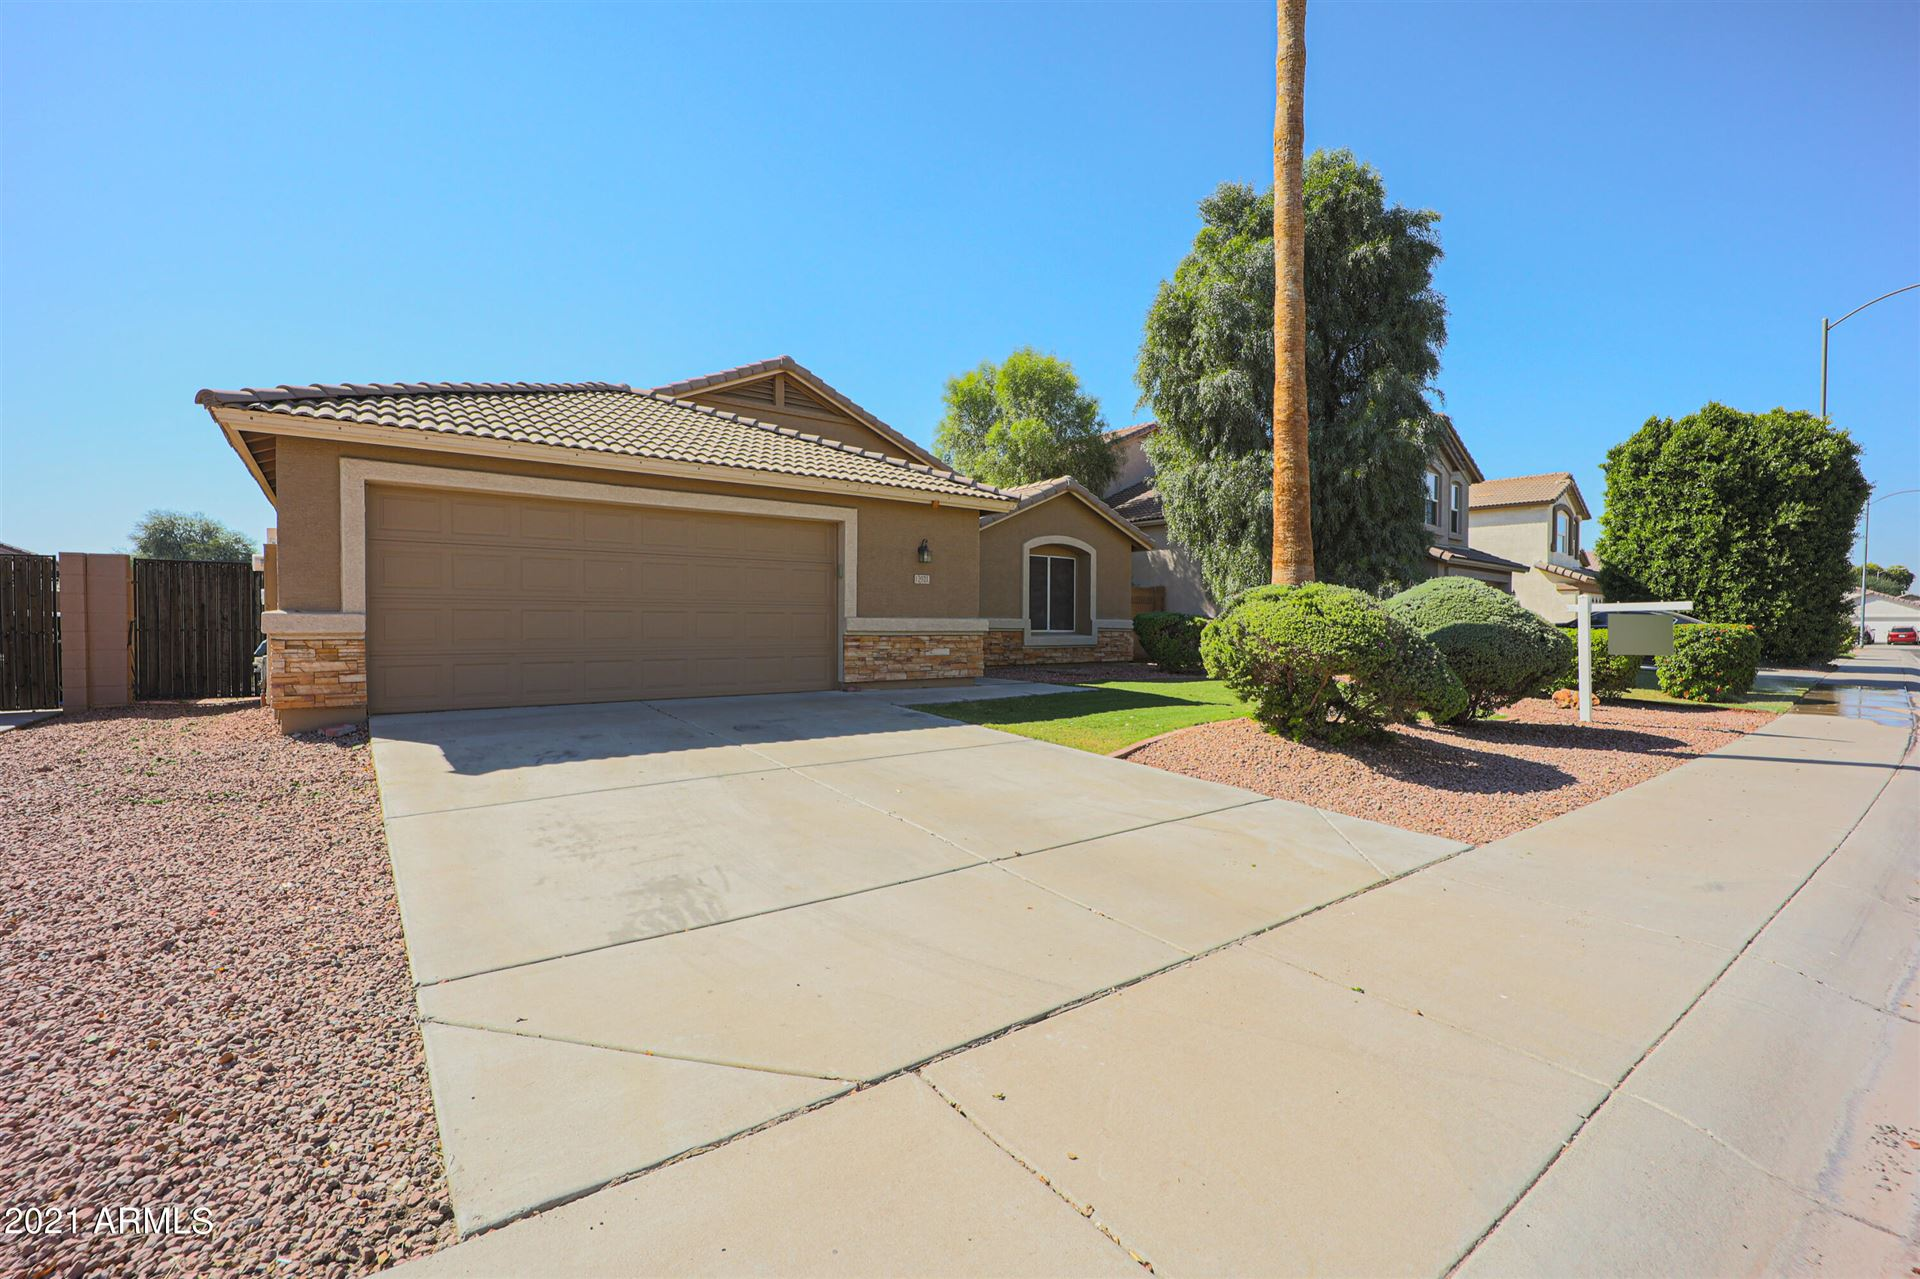 Photo of 12921 W Cheery Lynn Road, Avondale, AZ 85392 (MLS # 6307629)